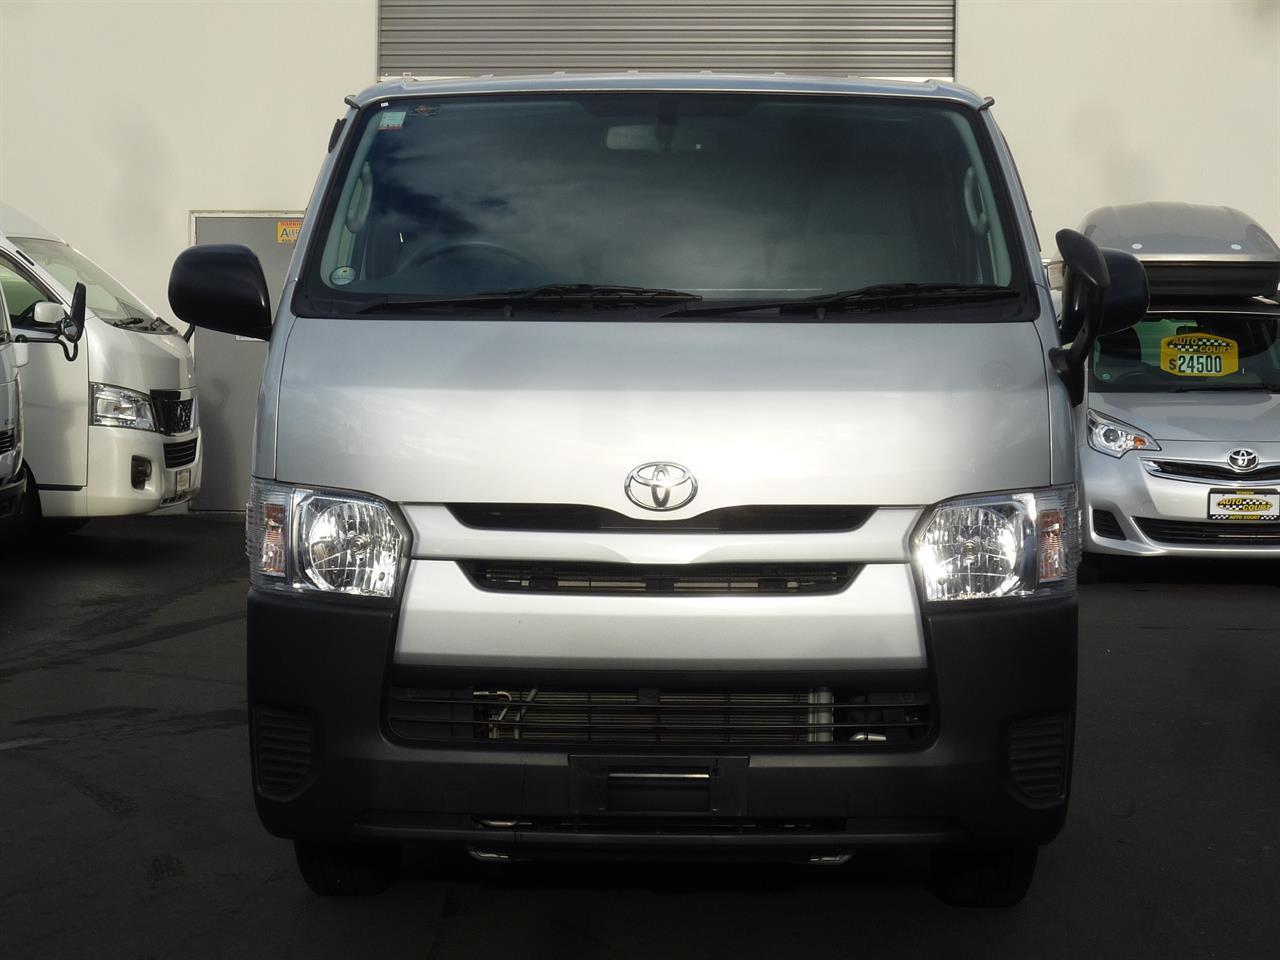 image-6, 2016 Toyota Hiace DX at Dunedin